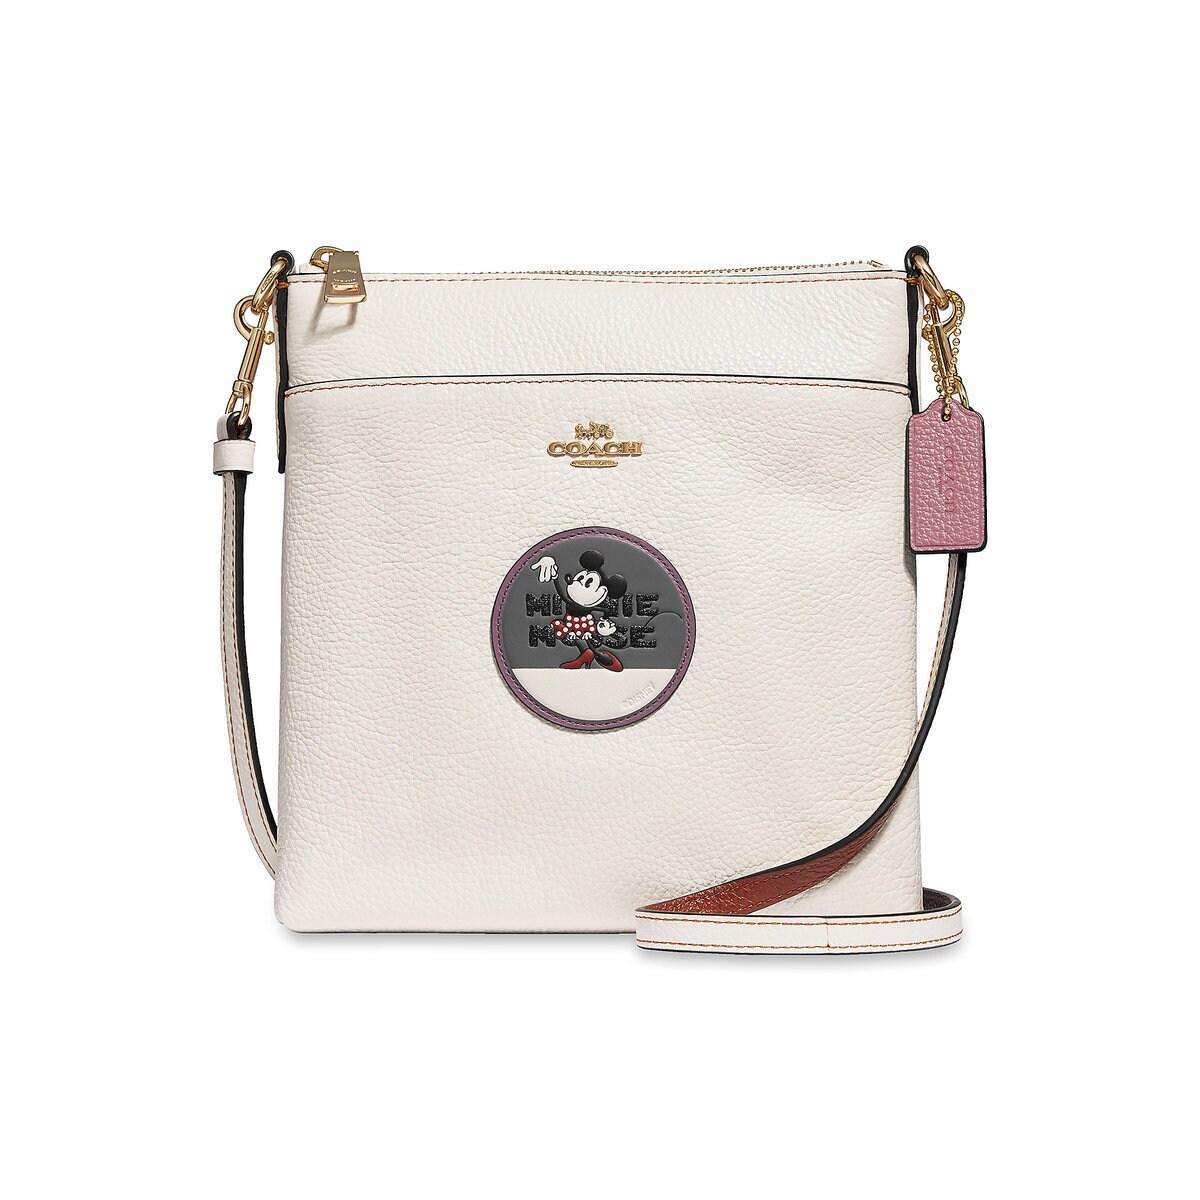 super popular f294e f509f Minnie Mouse Crossbody Bag by COACH